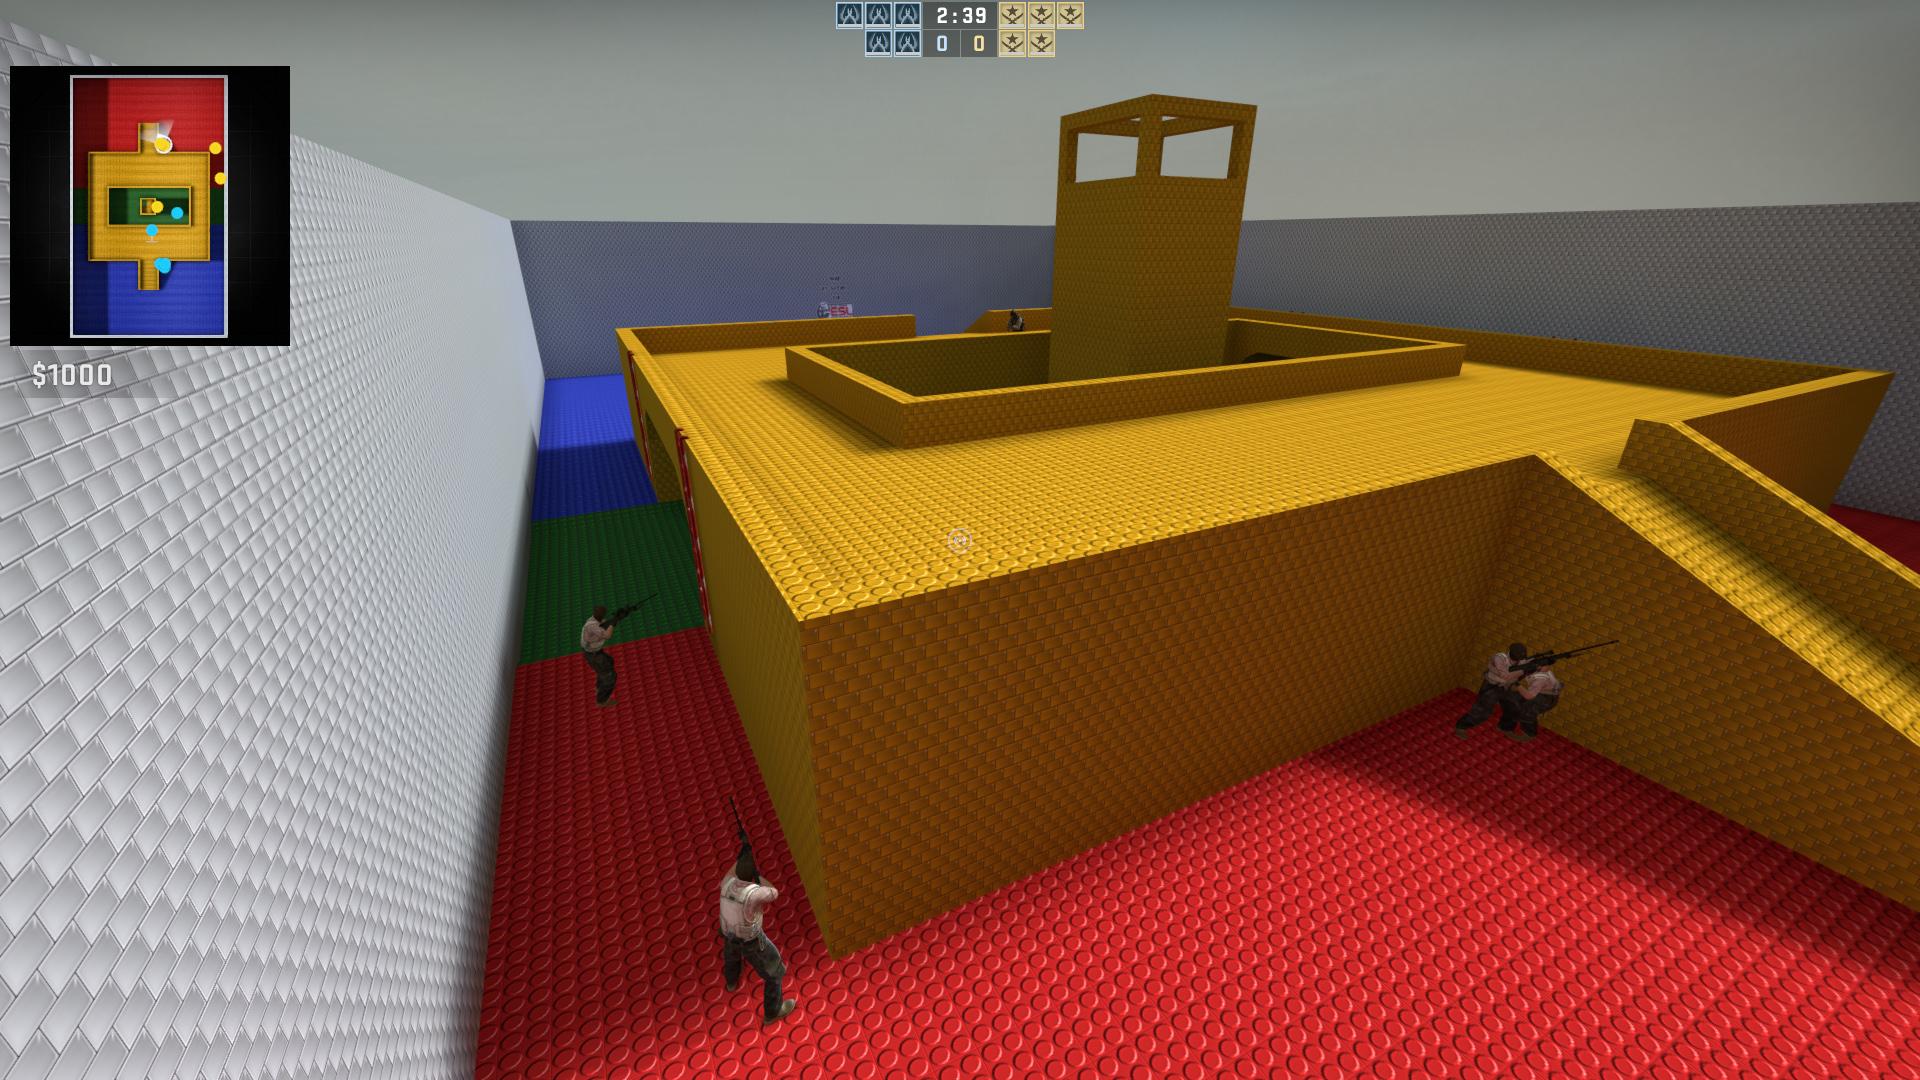 AWP LEGO 2